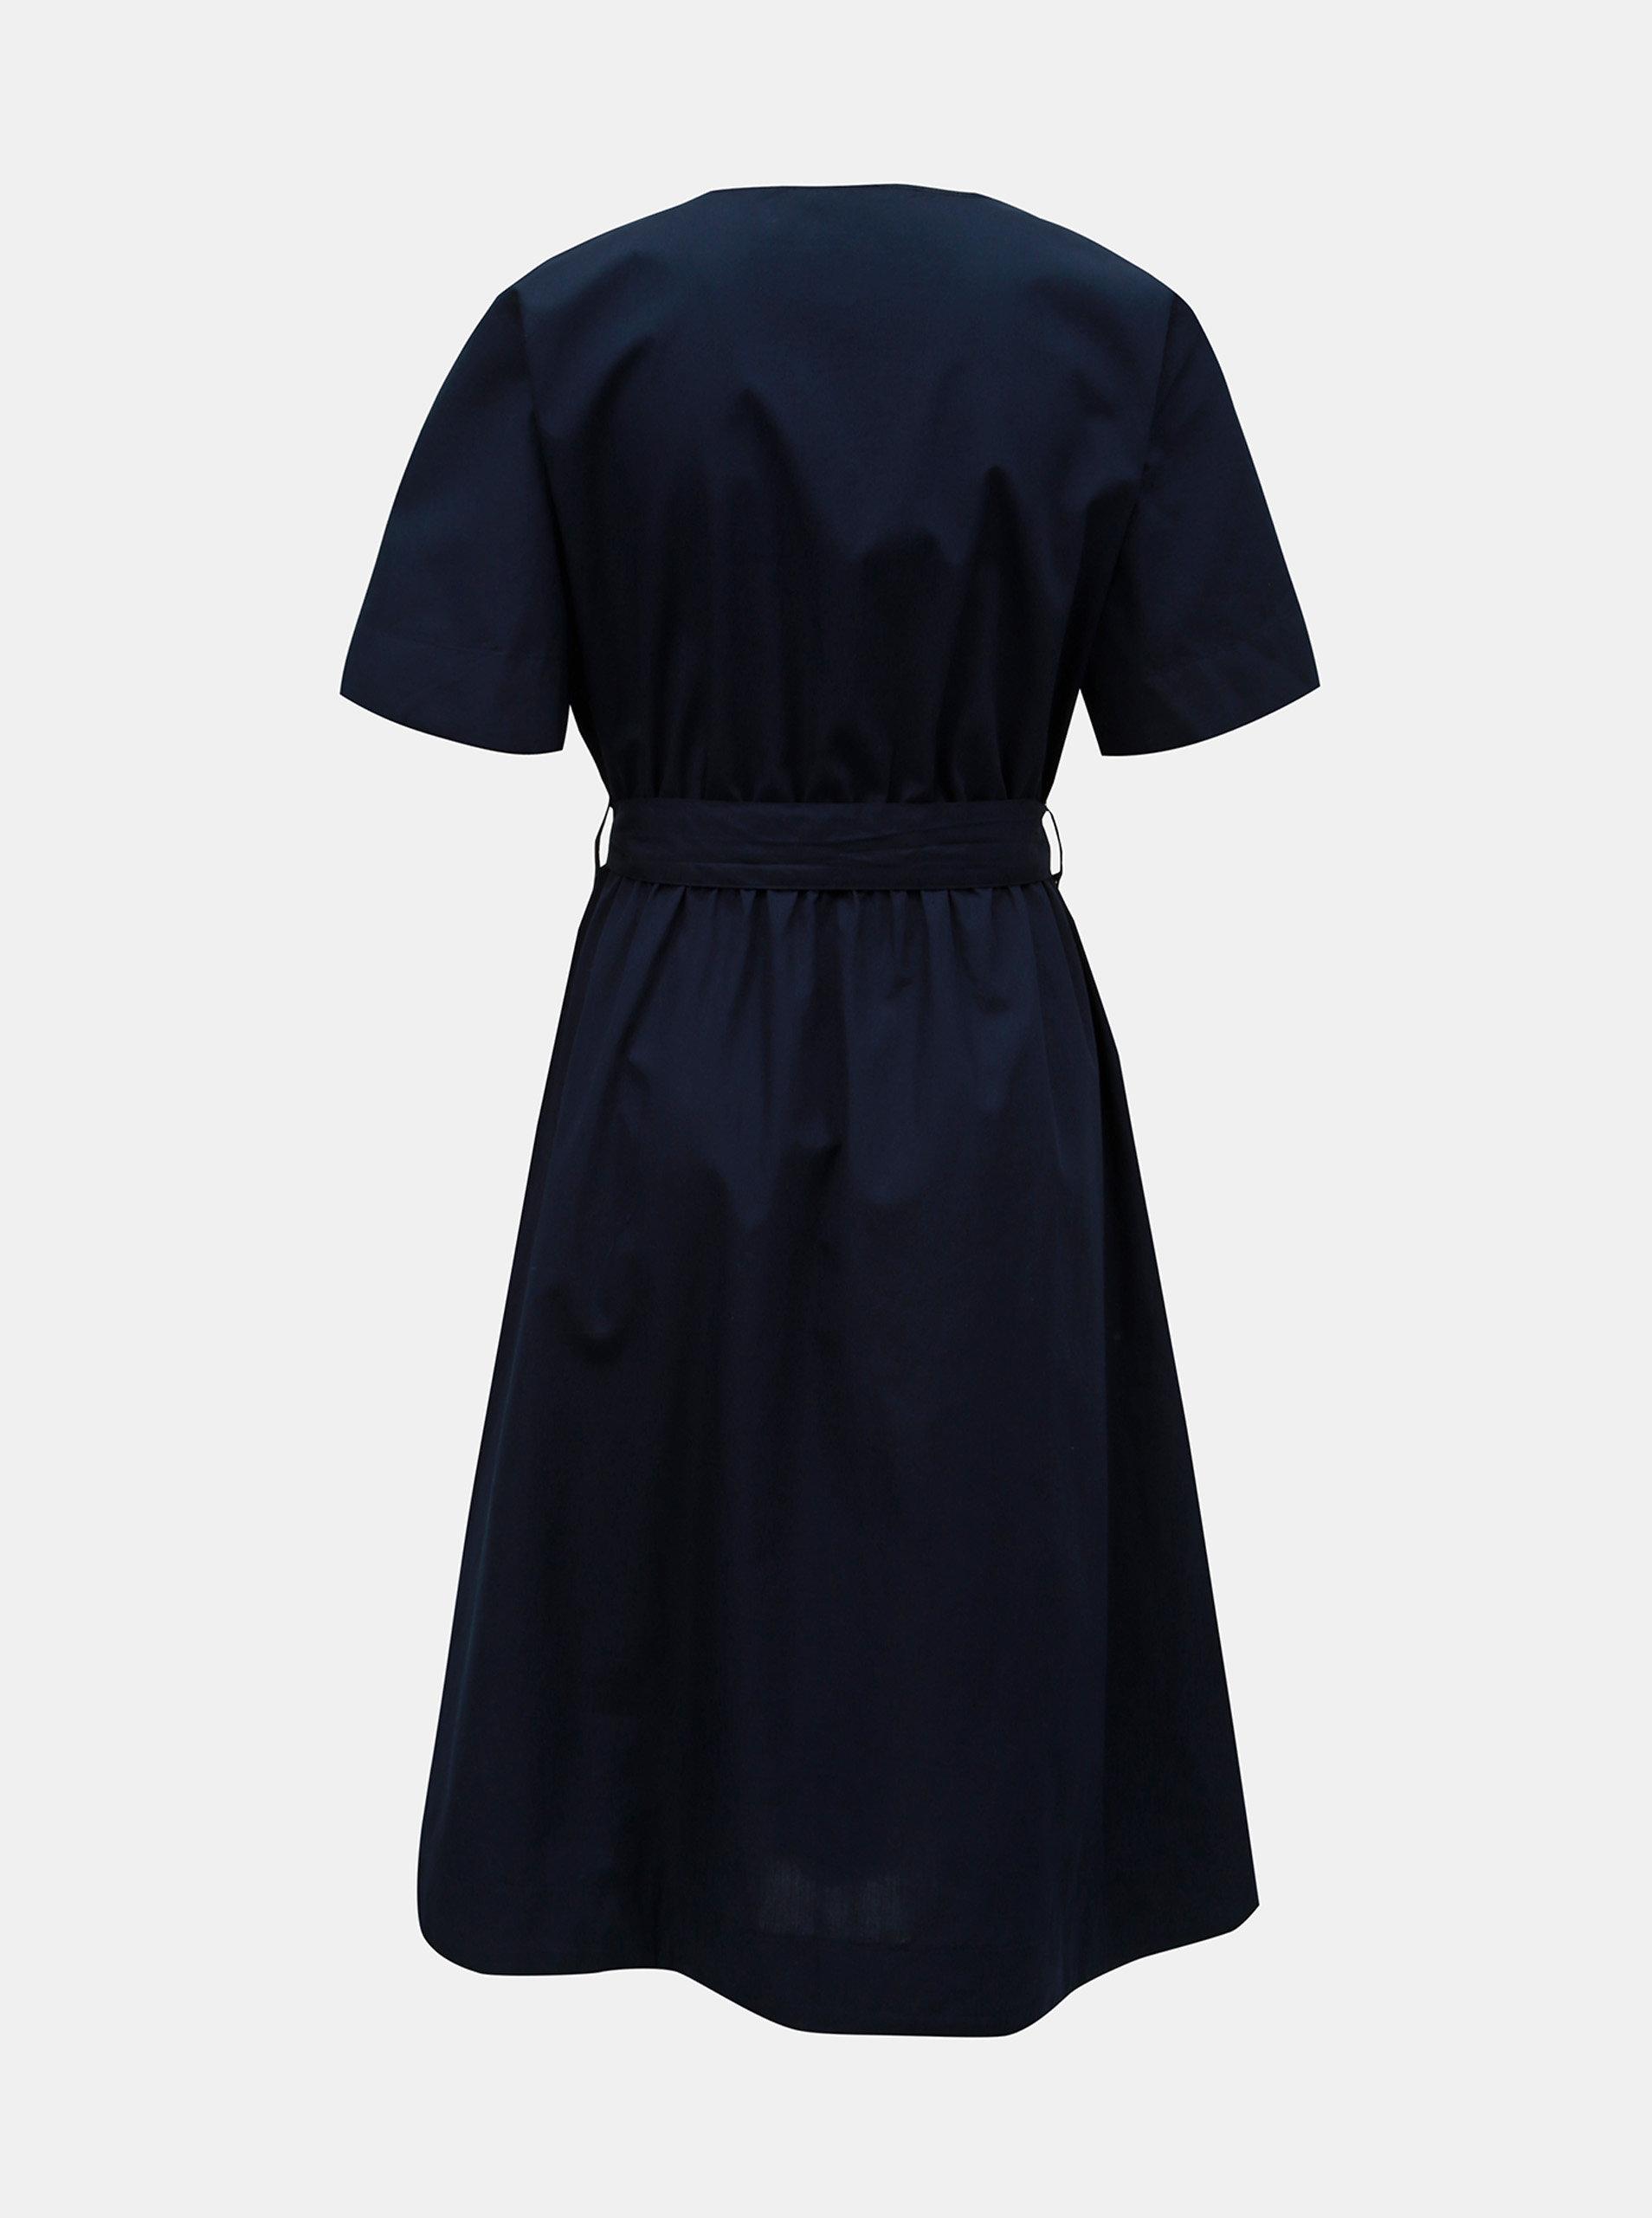 57ebb6697416 Tmavomodré šaty s opaskom VERO MODA Kammi ...